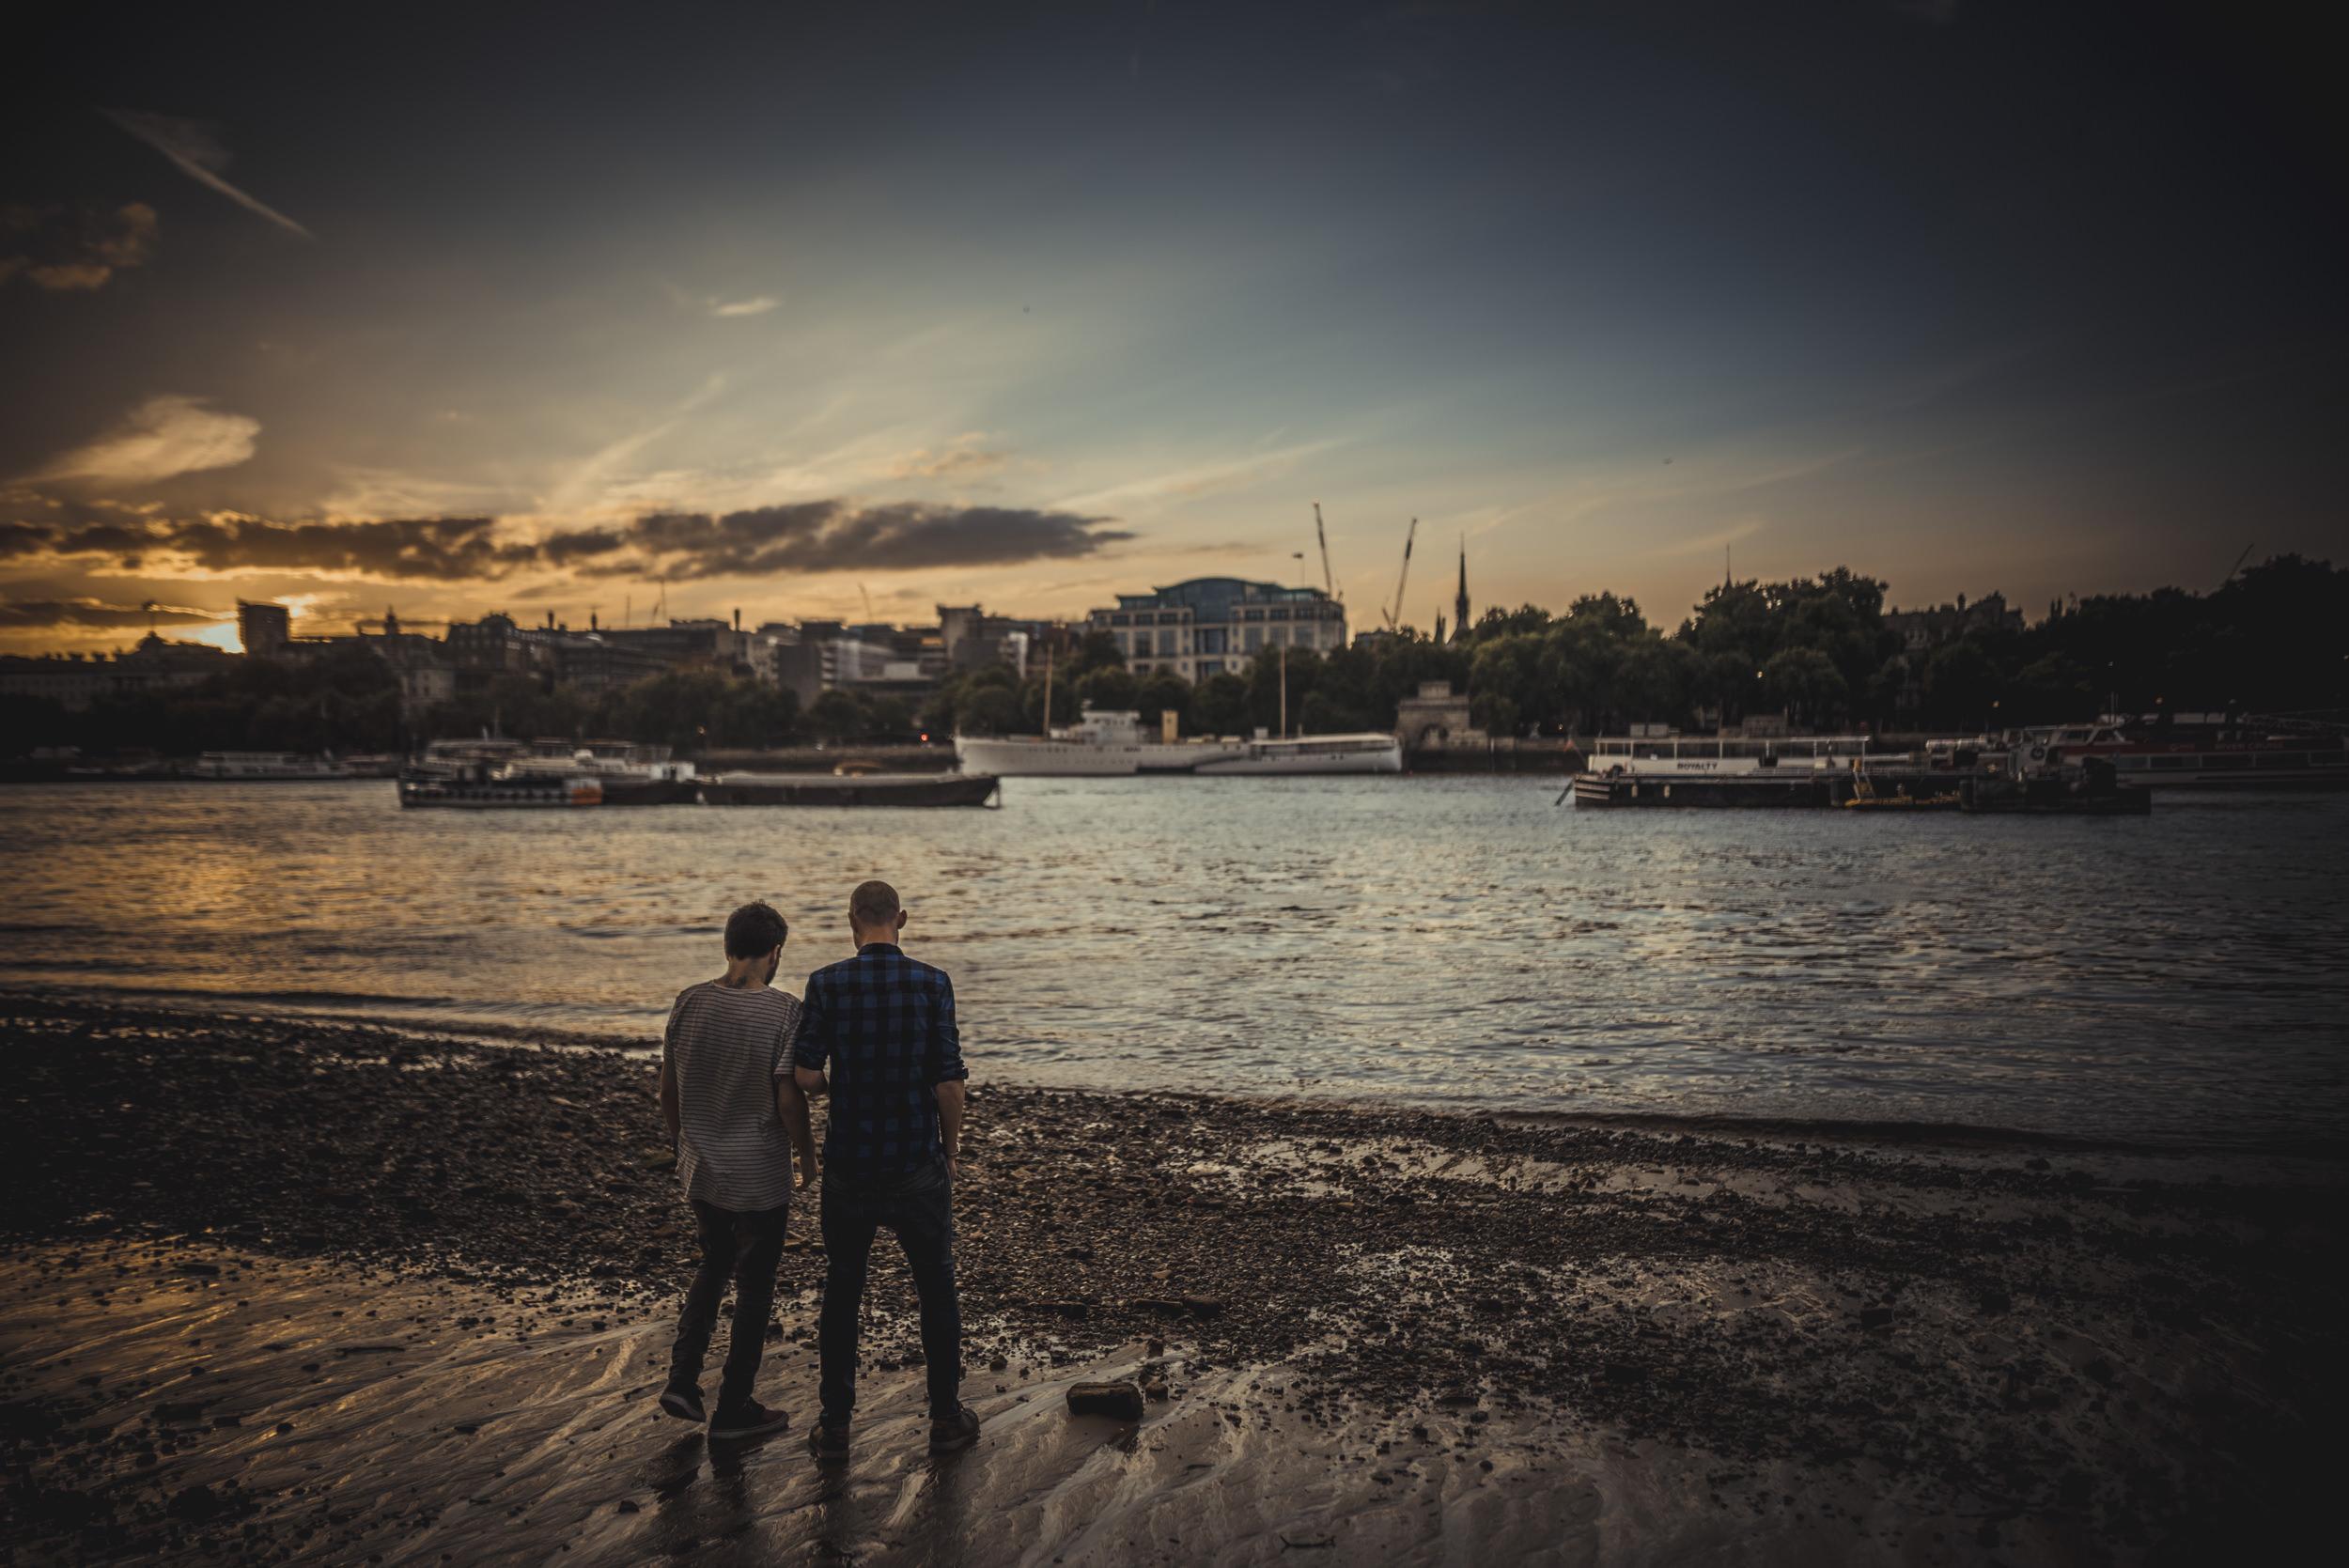 Rhys-and-Alex-engagement-session-london-gay-same-sex-manu-mendoza-wedding-photography-059.jpg